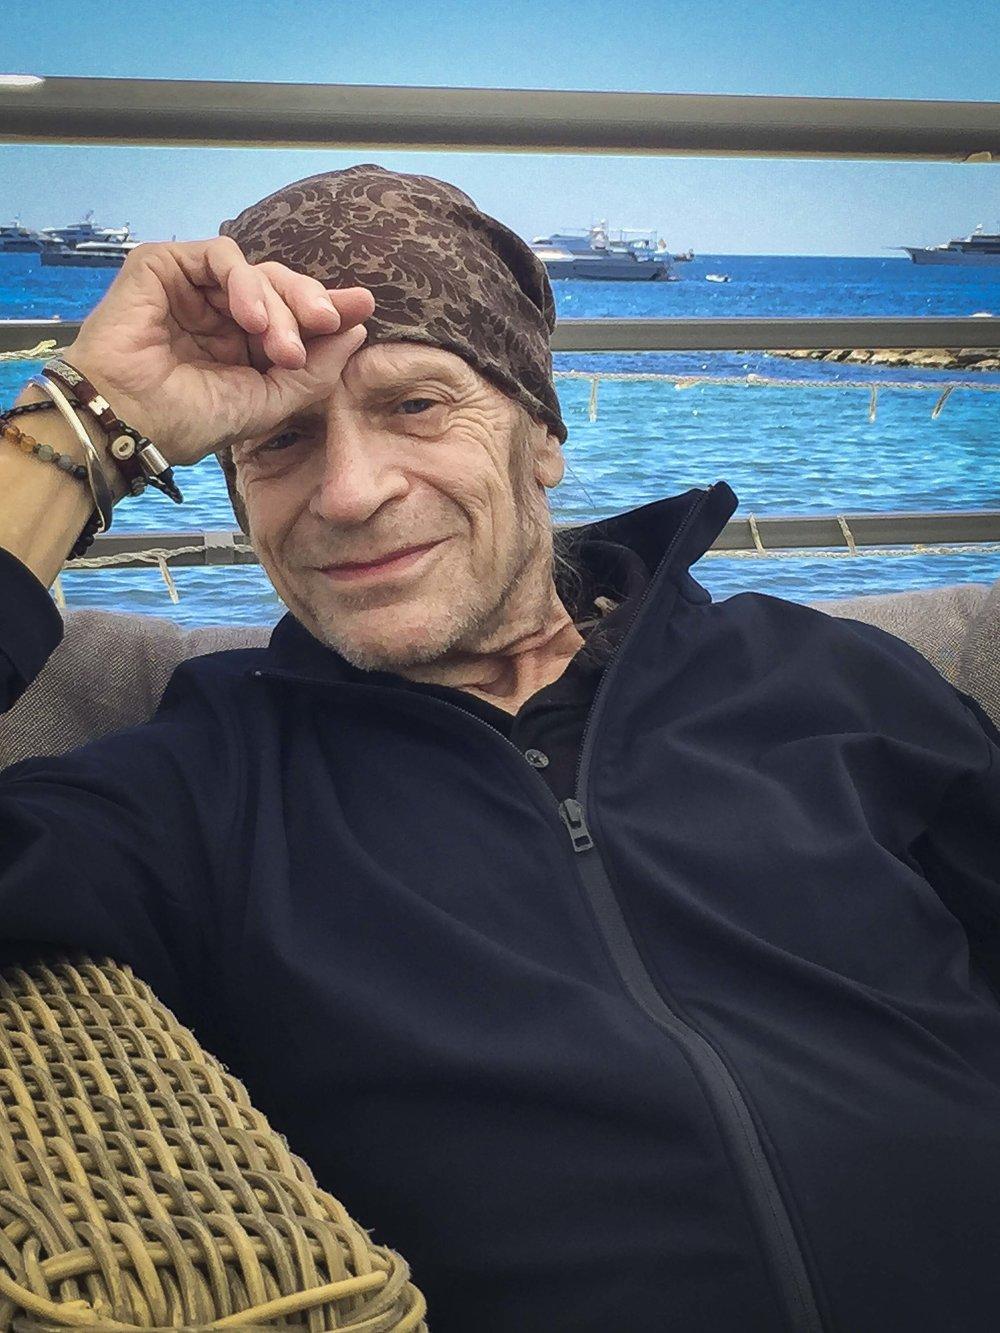 Leon Vitali by the ocean